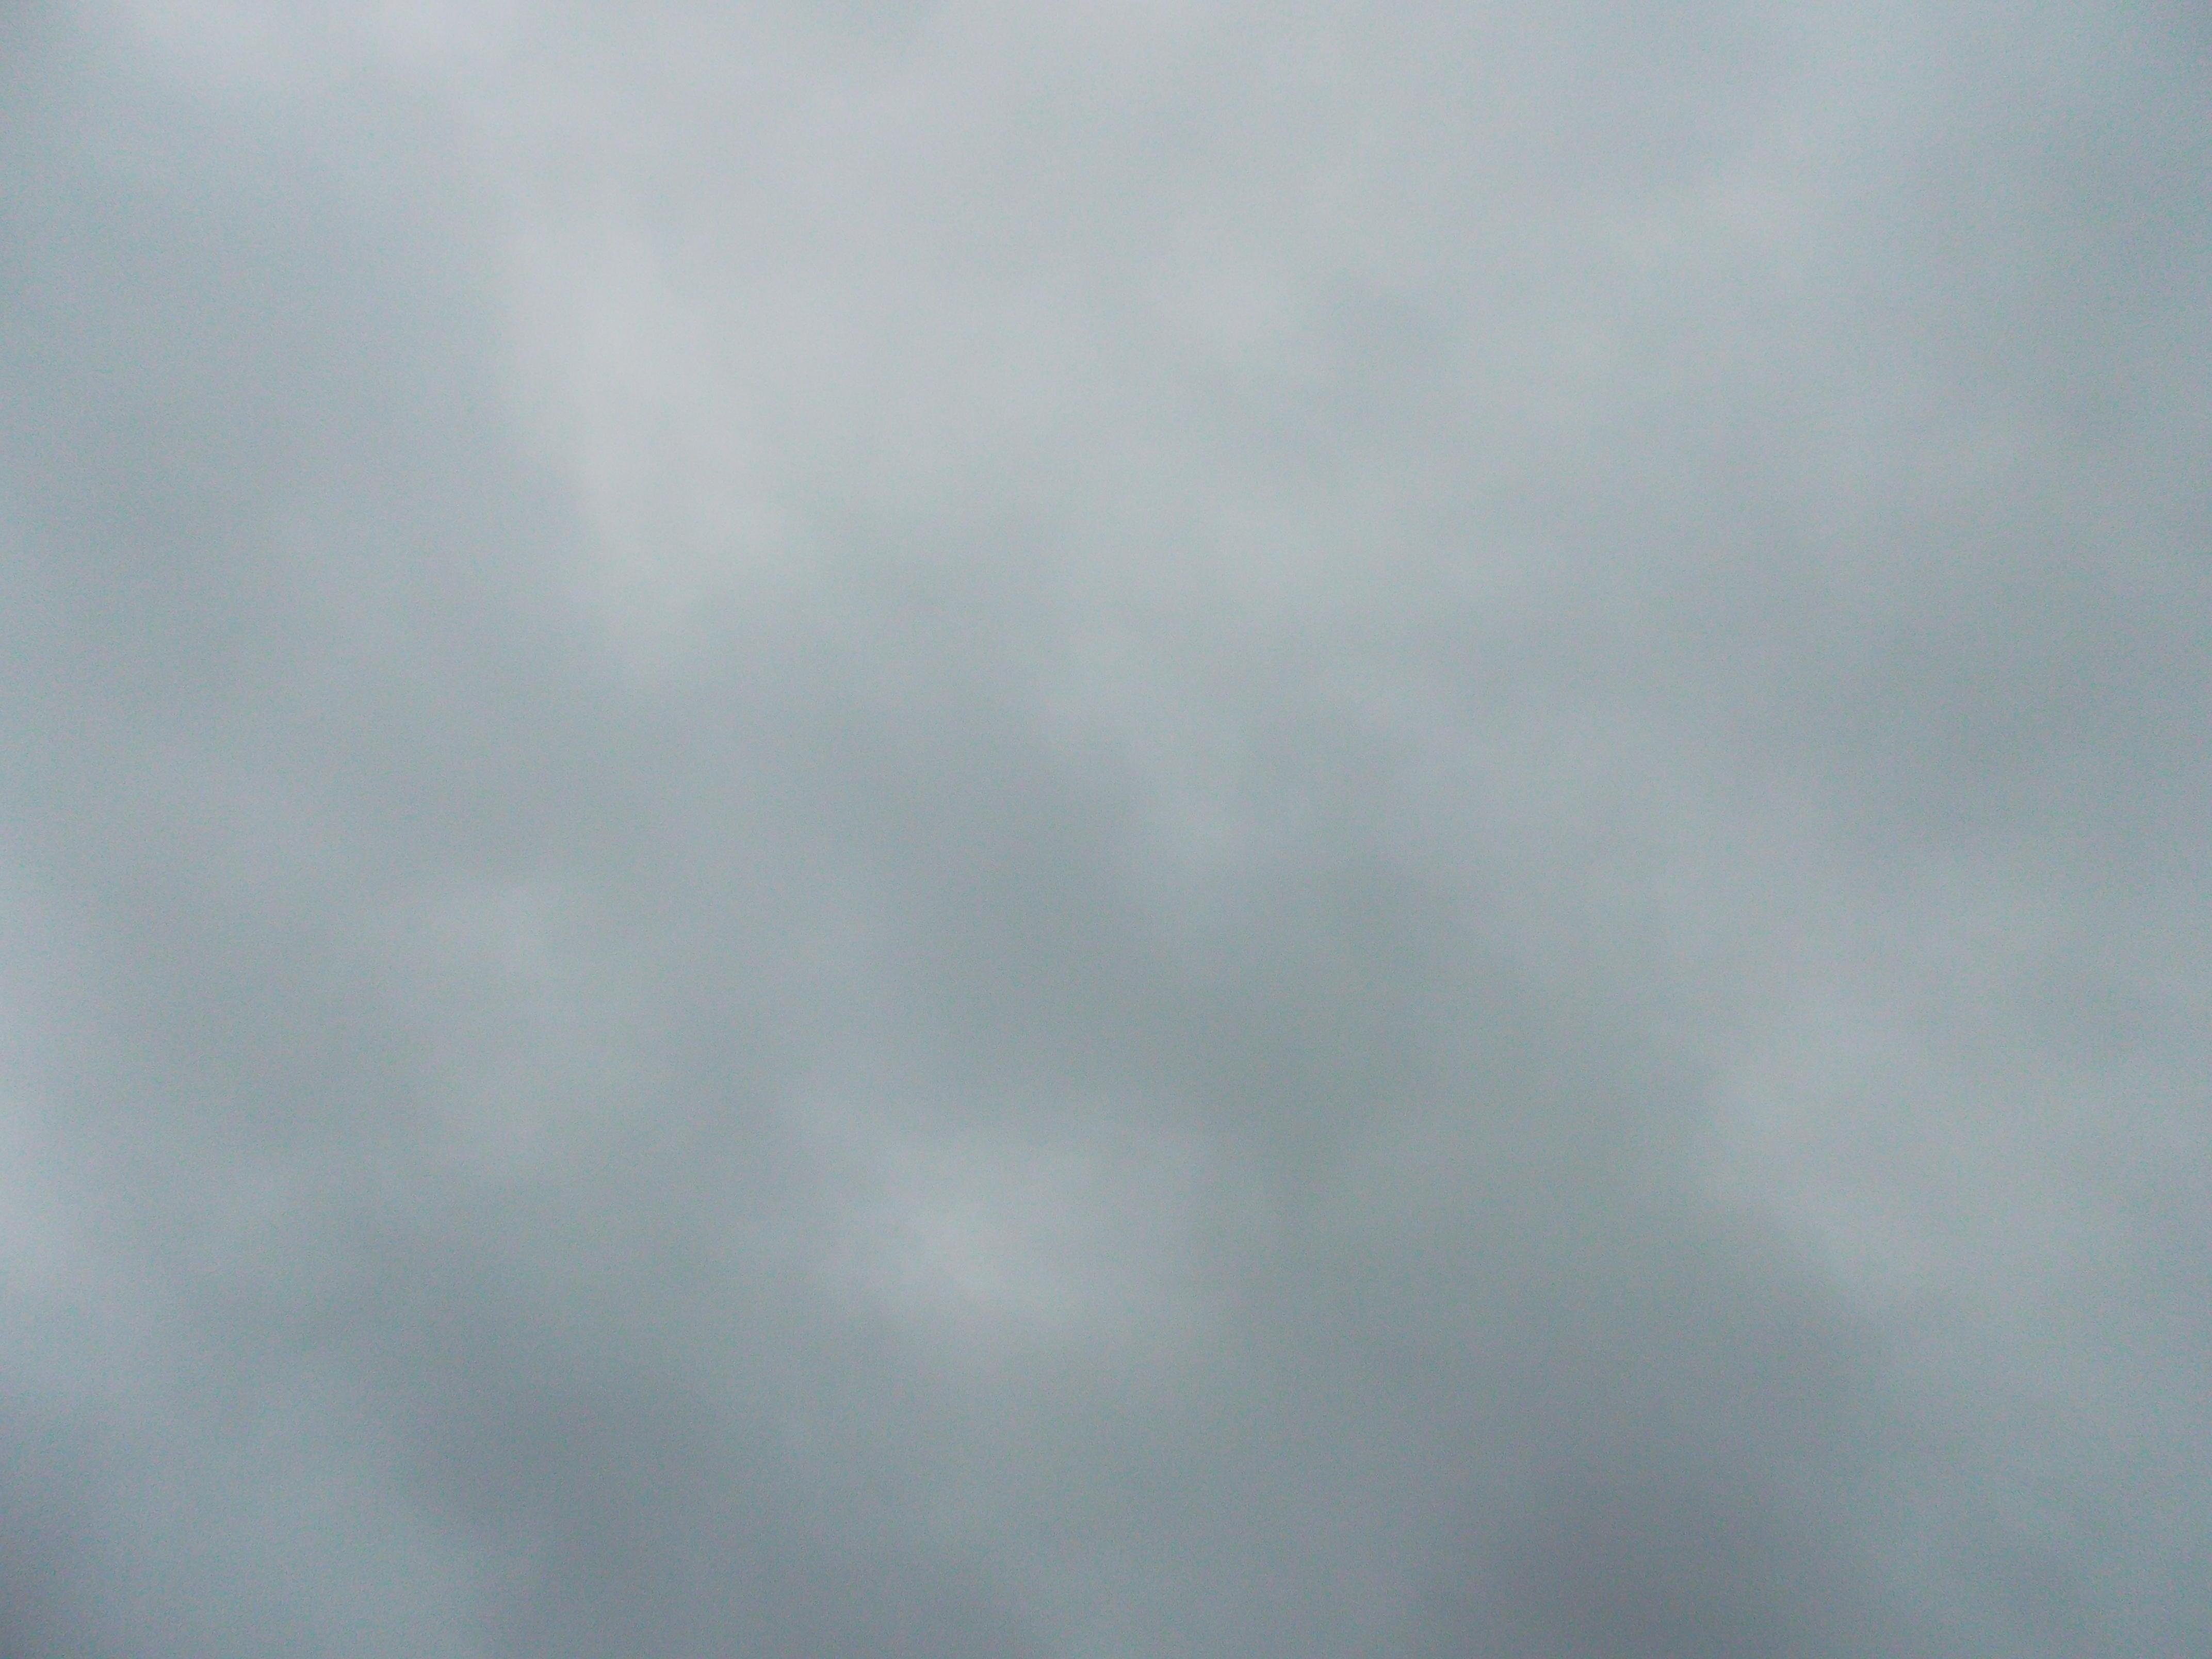 2013-05-20 Longitude -0.371 Latitude 49.182 Altitude 29 Heure 12h31